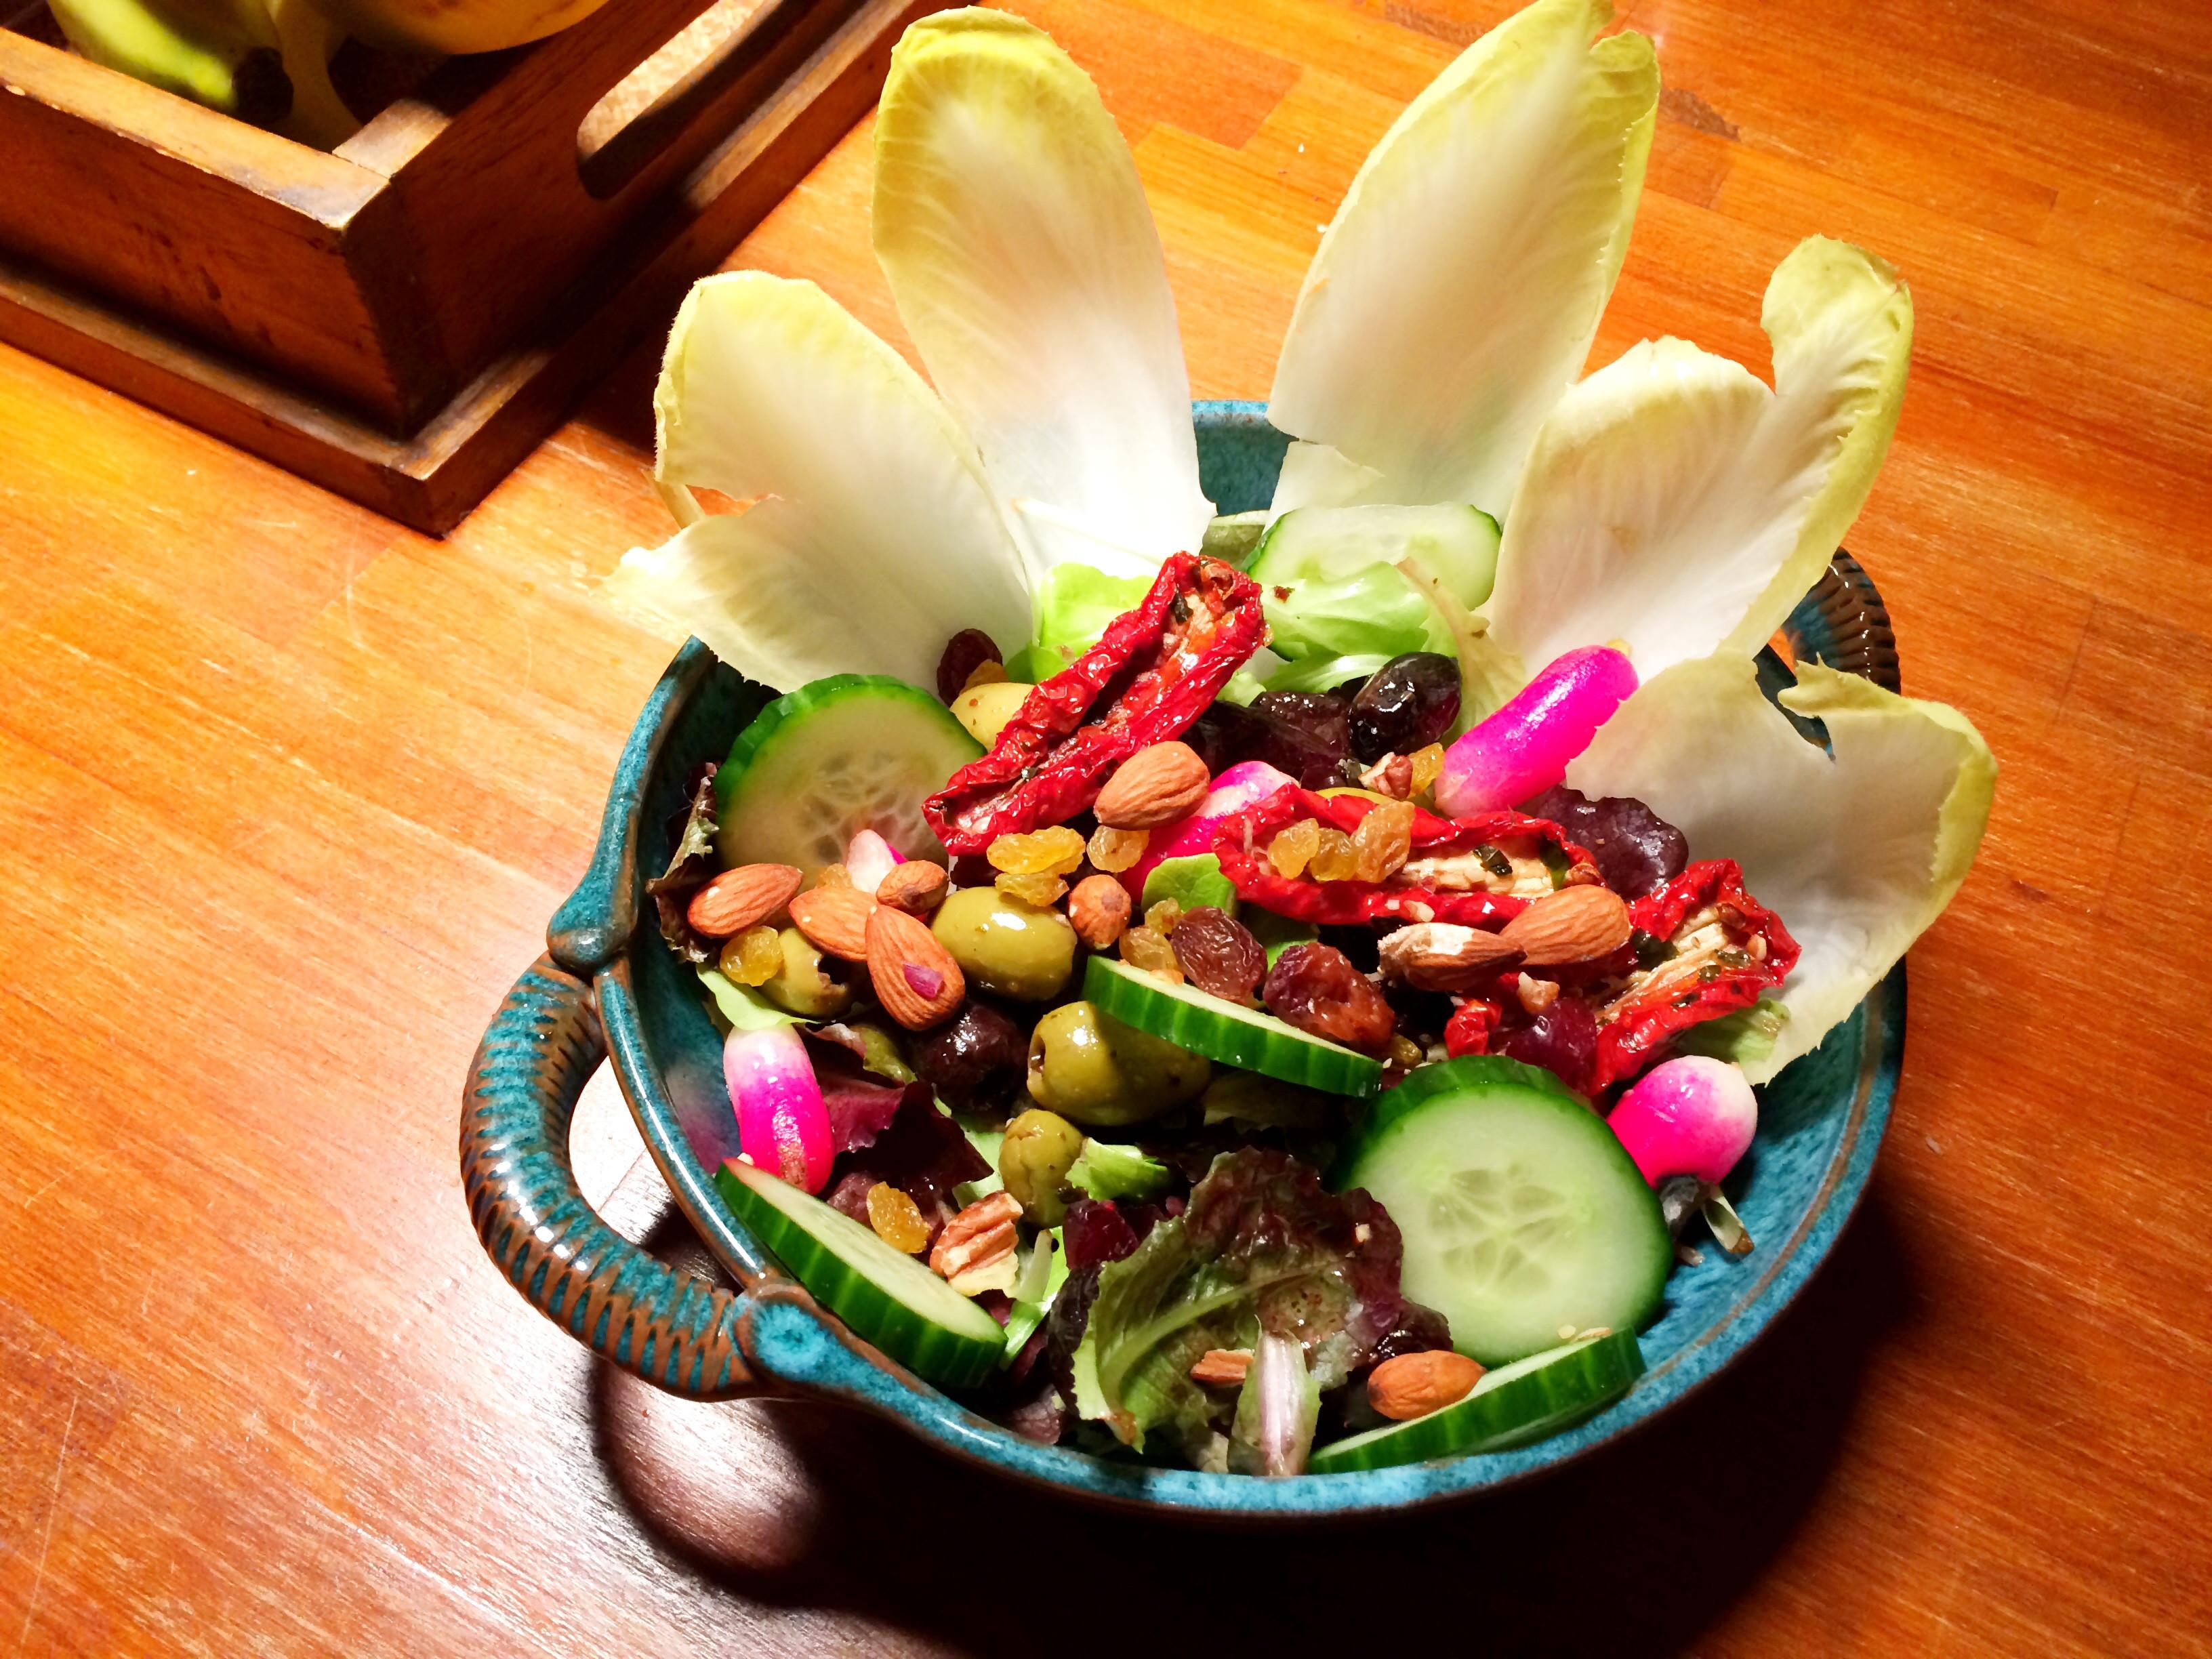 Super Healthy Salads  A Colourful Super Healthy Salad Vegan Weight Loss Mentor